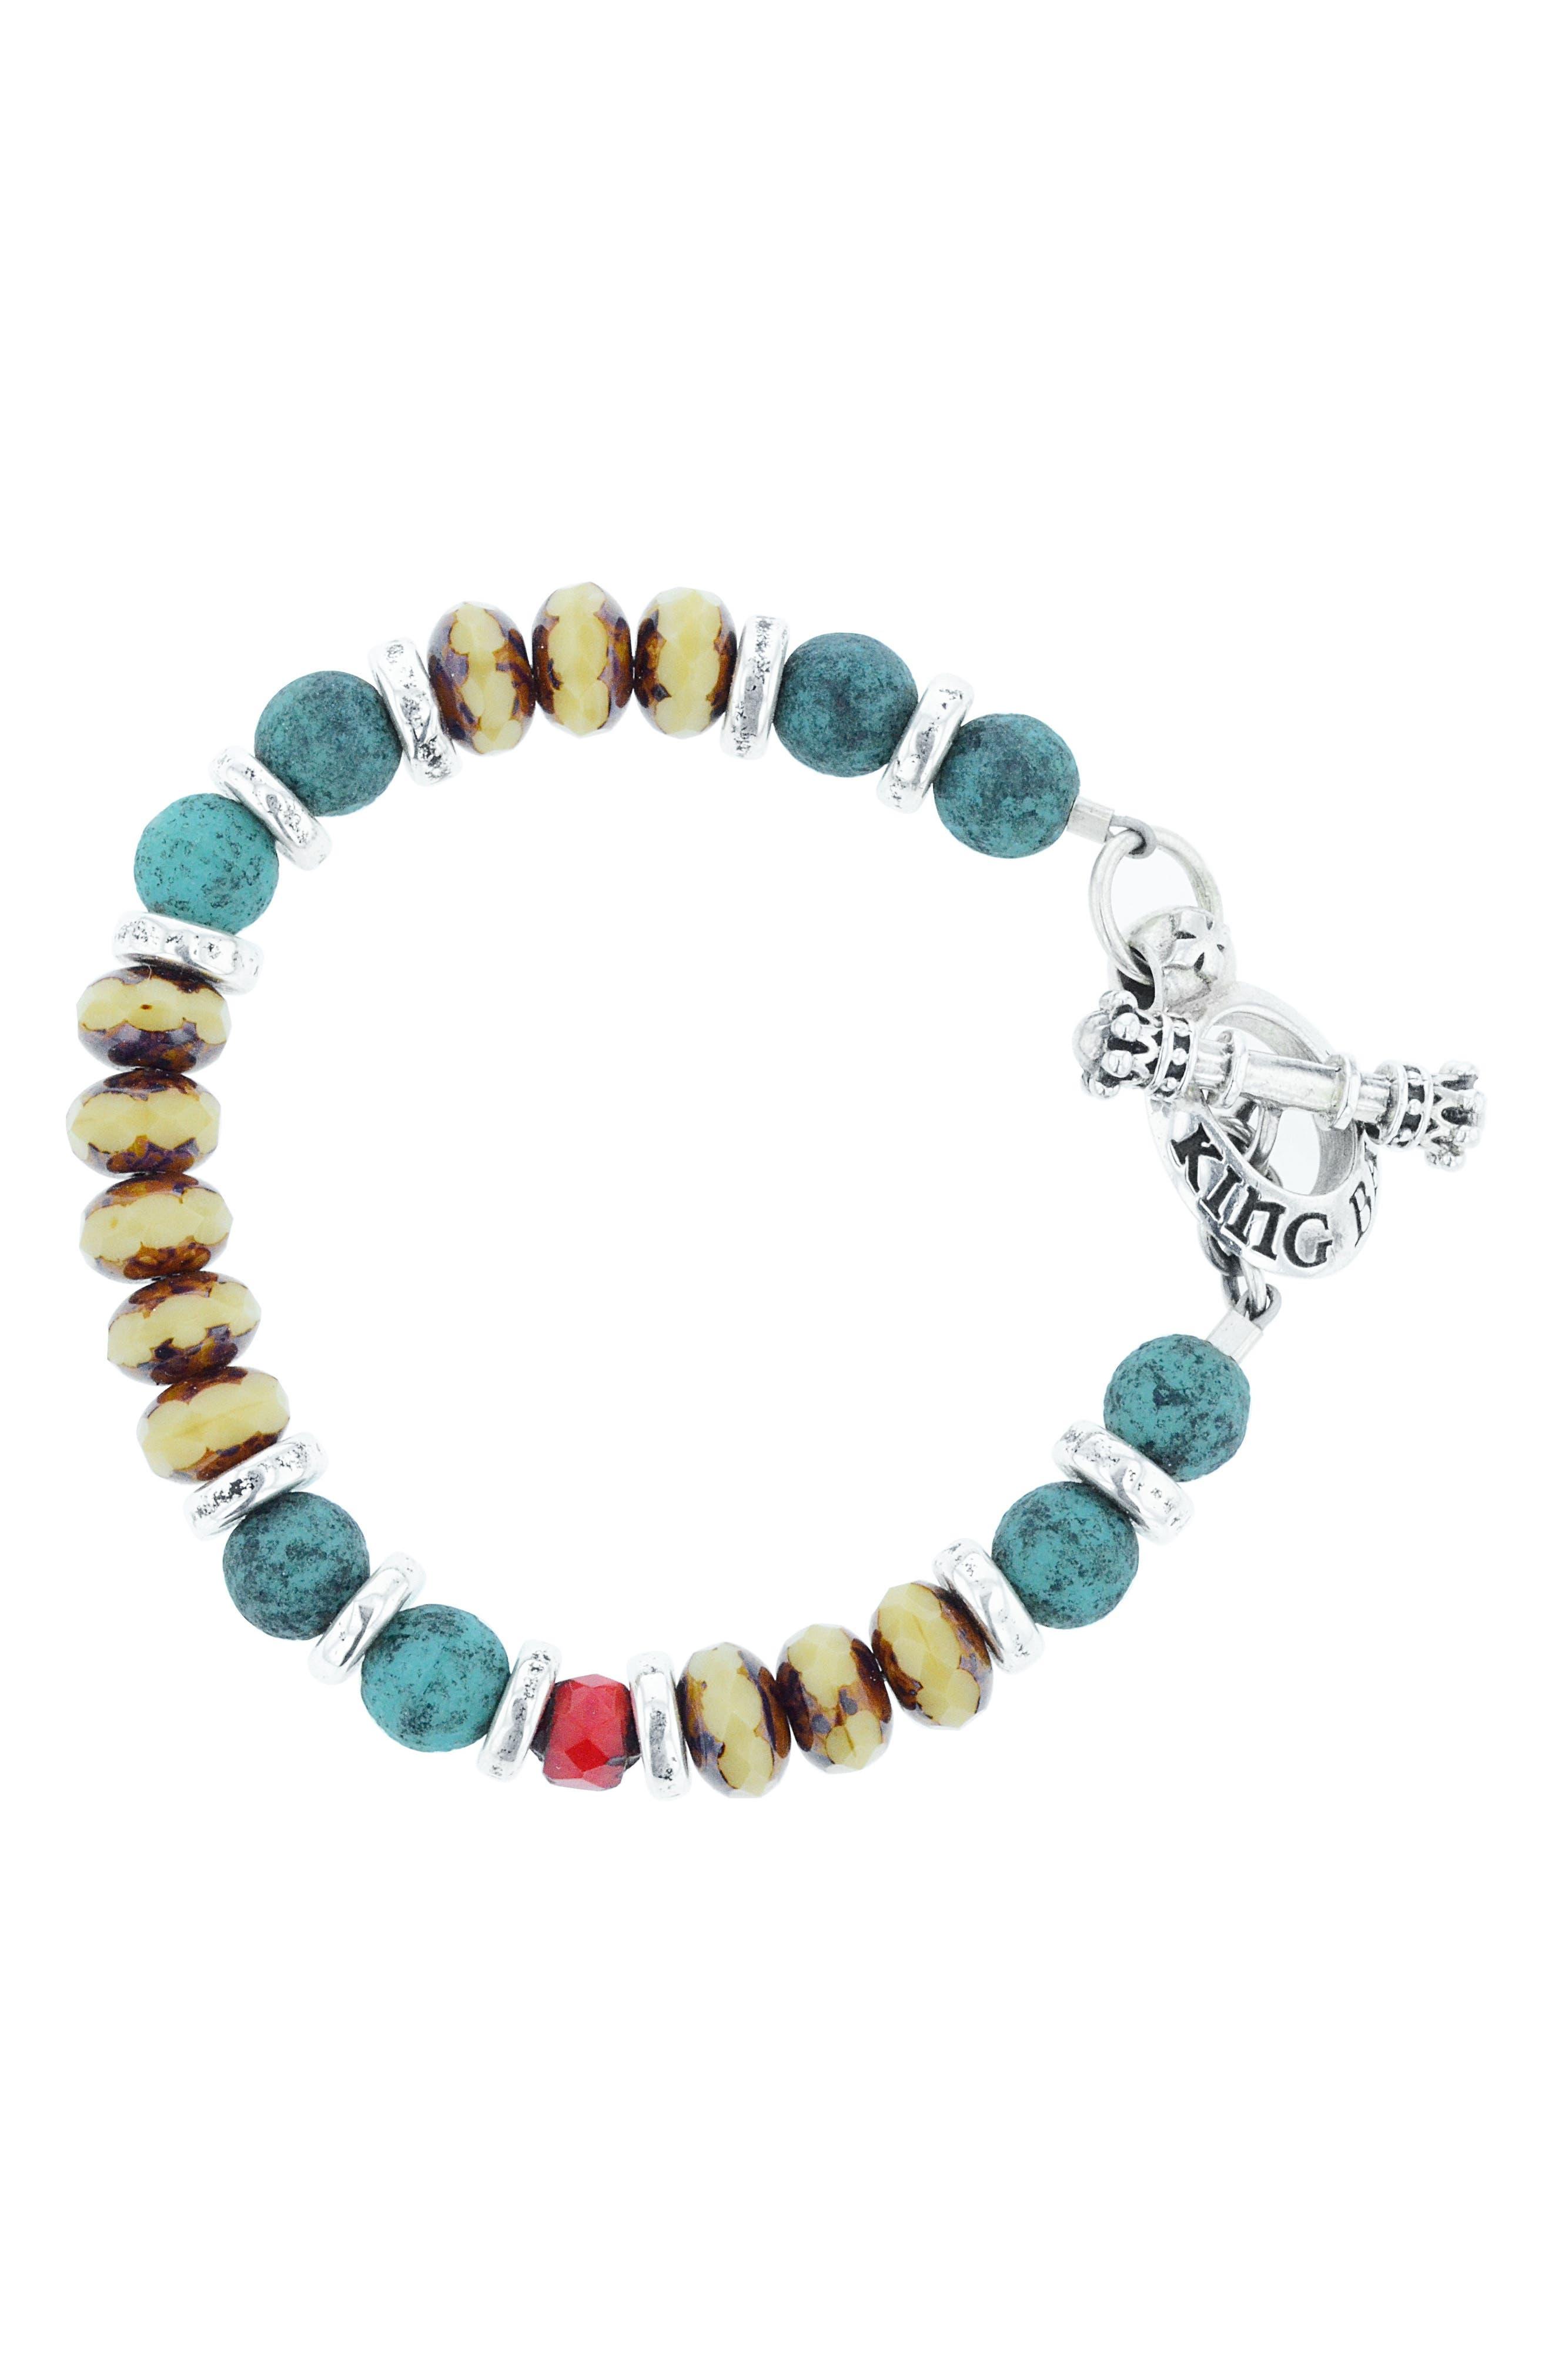 American Voices Ceramic & Glass Bead Bracelet,                             Main thumbnail 1, color,                             TURQUOISE